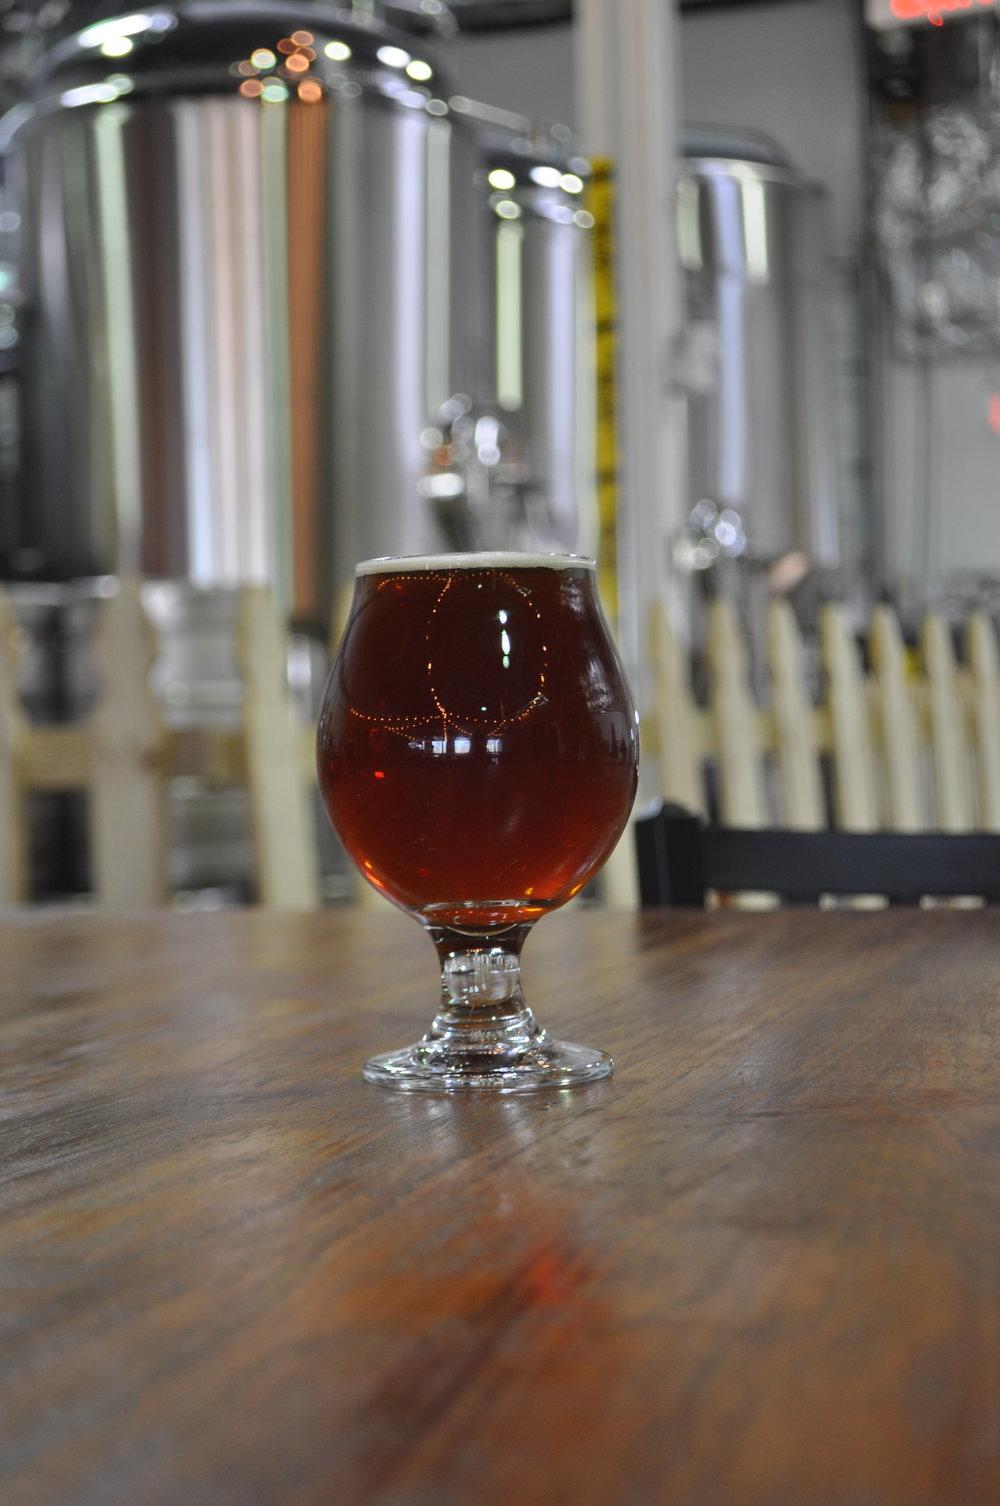 5 Round KO Barrel - Aged Amber Ale - 8.1% abv -